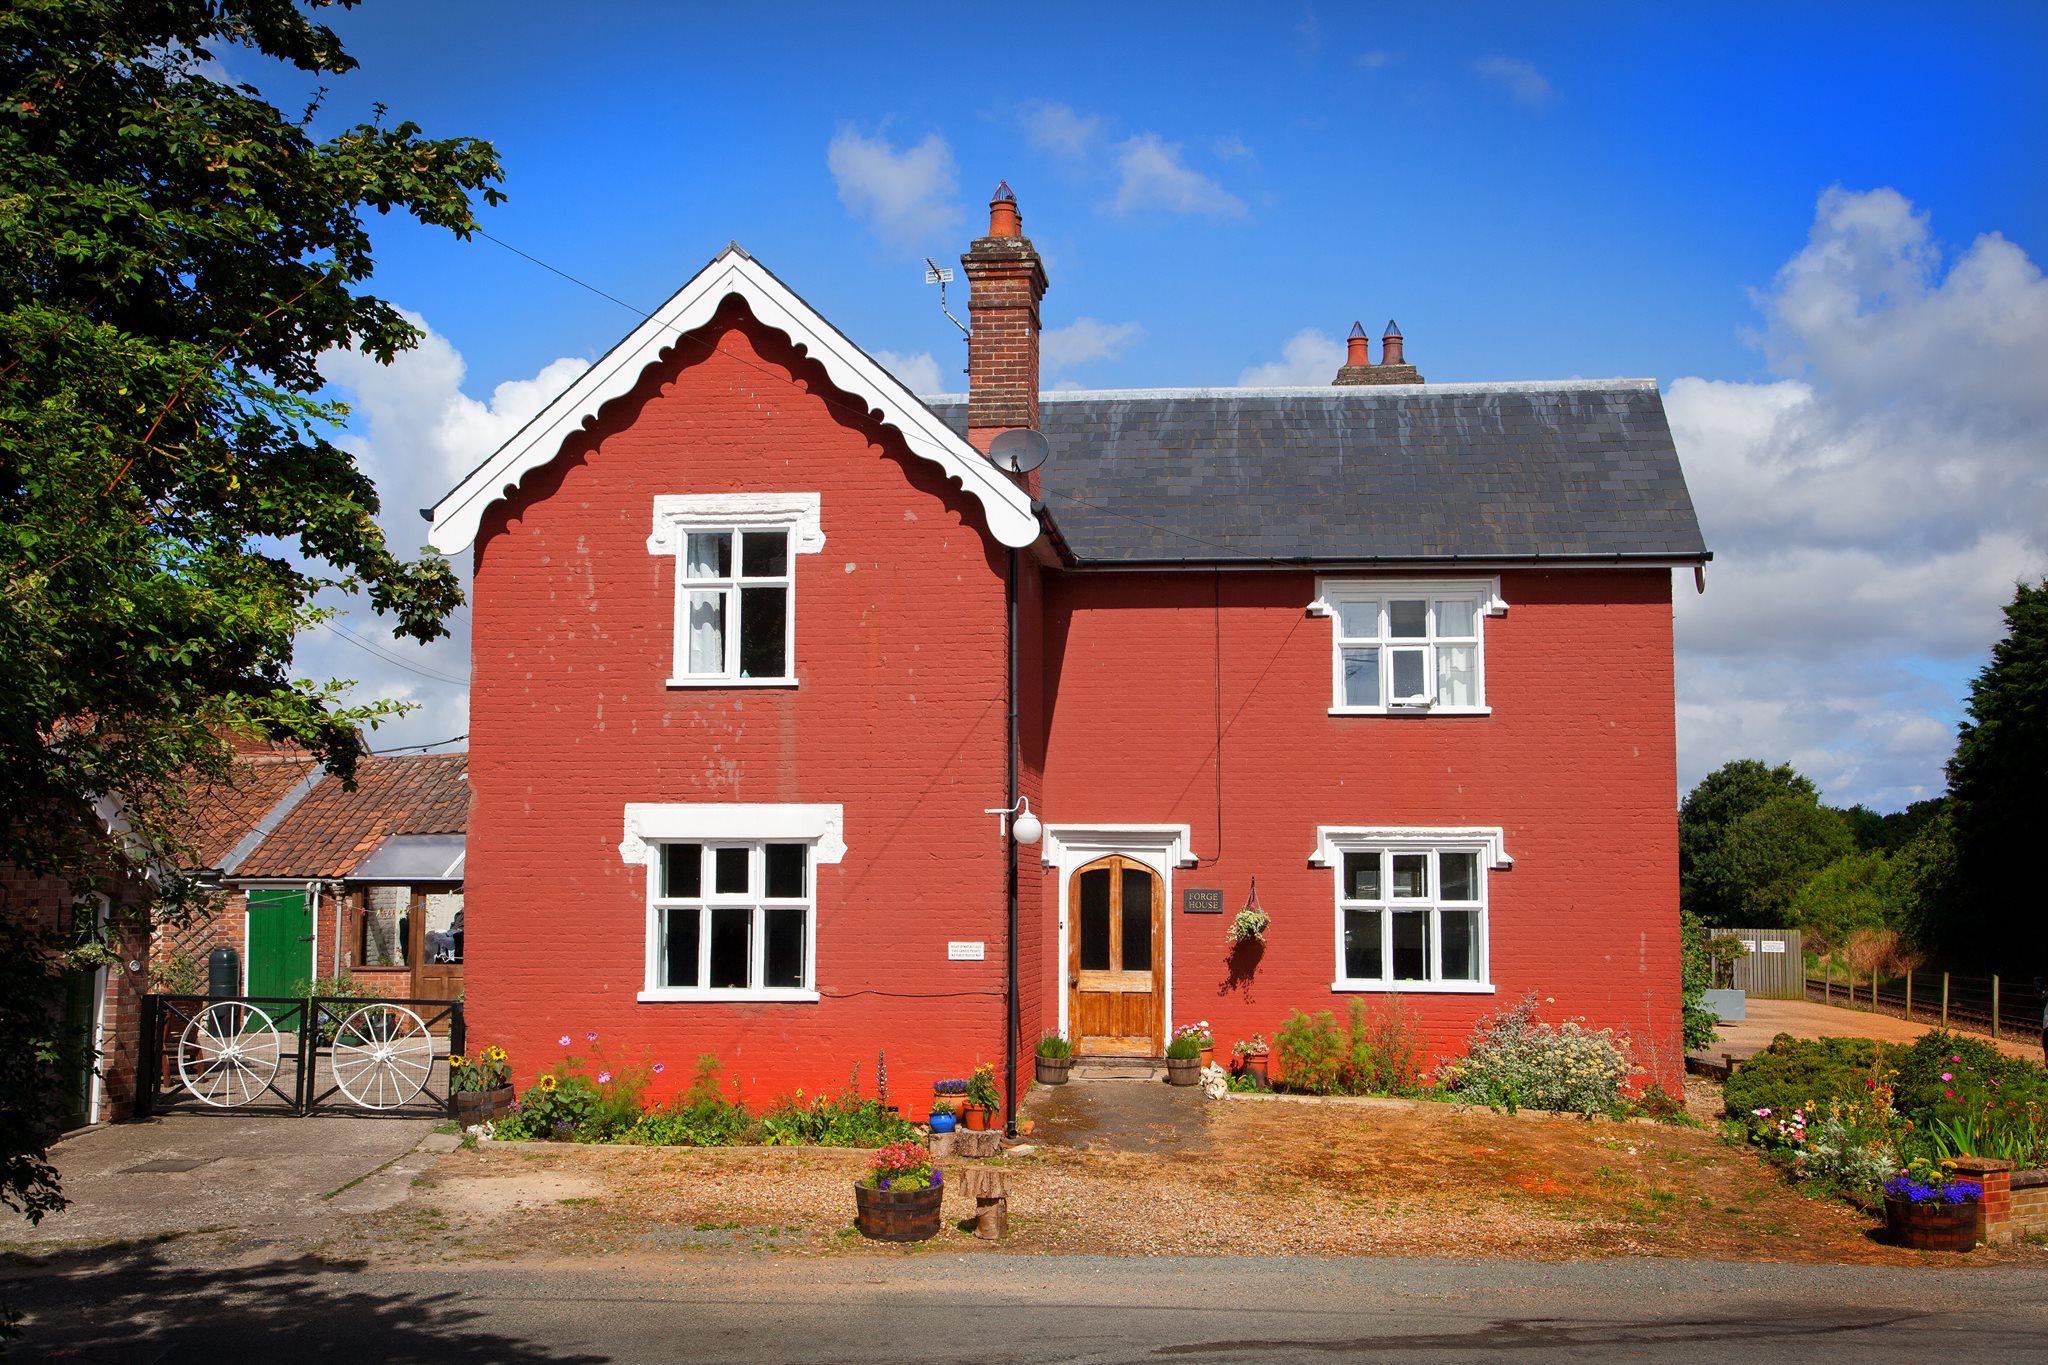 Forge House Yaxham, Norfolk